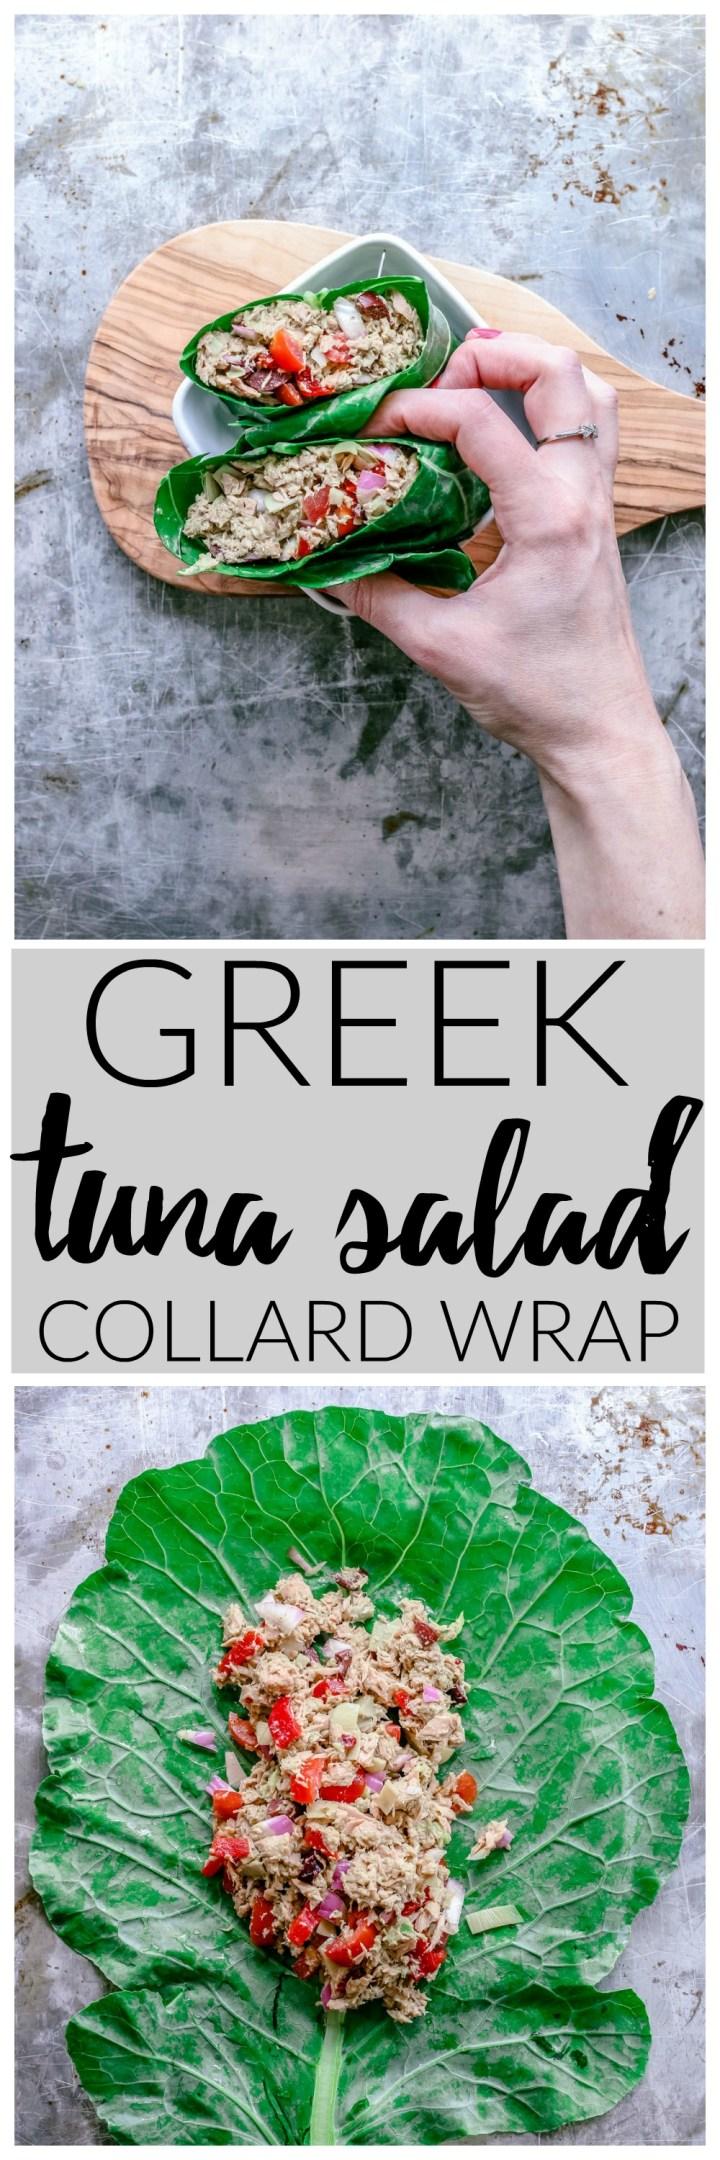 Greek Tuna Salad Collard Wrap | Killing Thyme